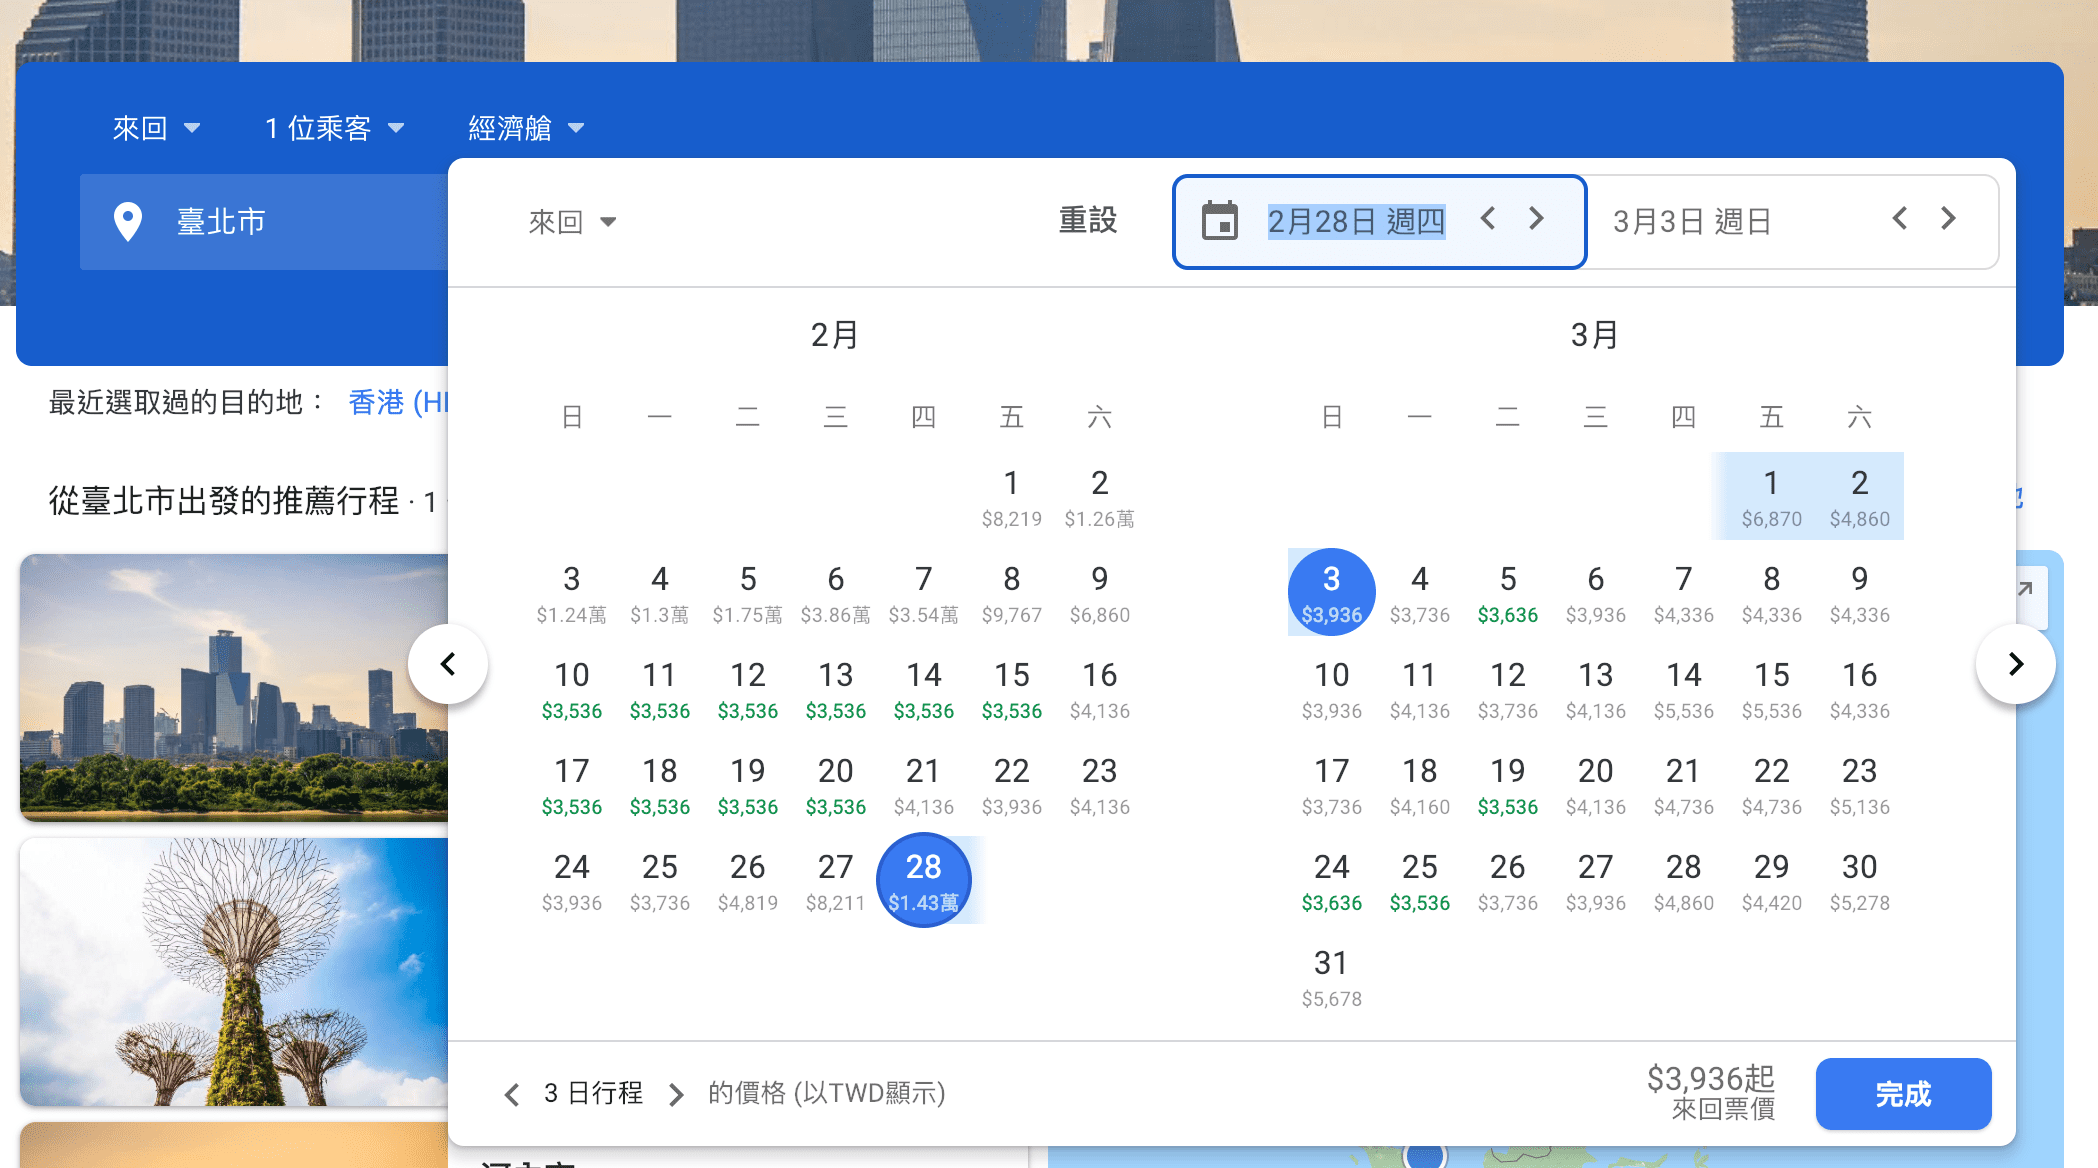 Google Flights 可以一次顯示兩個月的機票價格(研究生的點數旅行筆記)